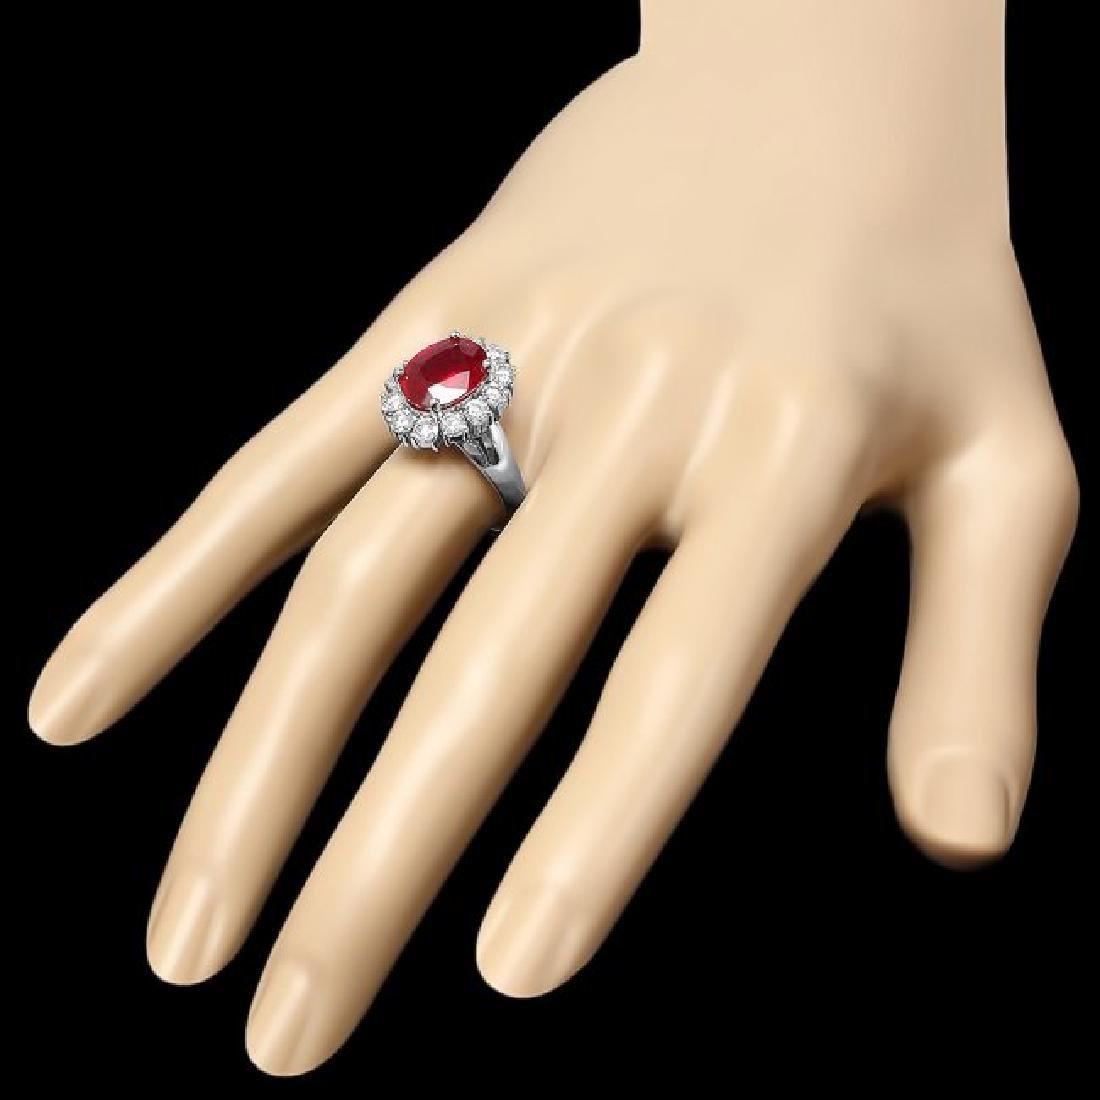 14k White Gold 4.30ct Ruby 1.40ct Diamond Ring - 3